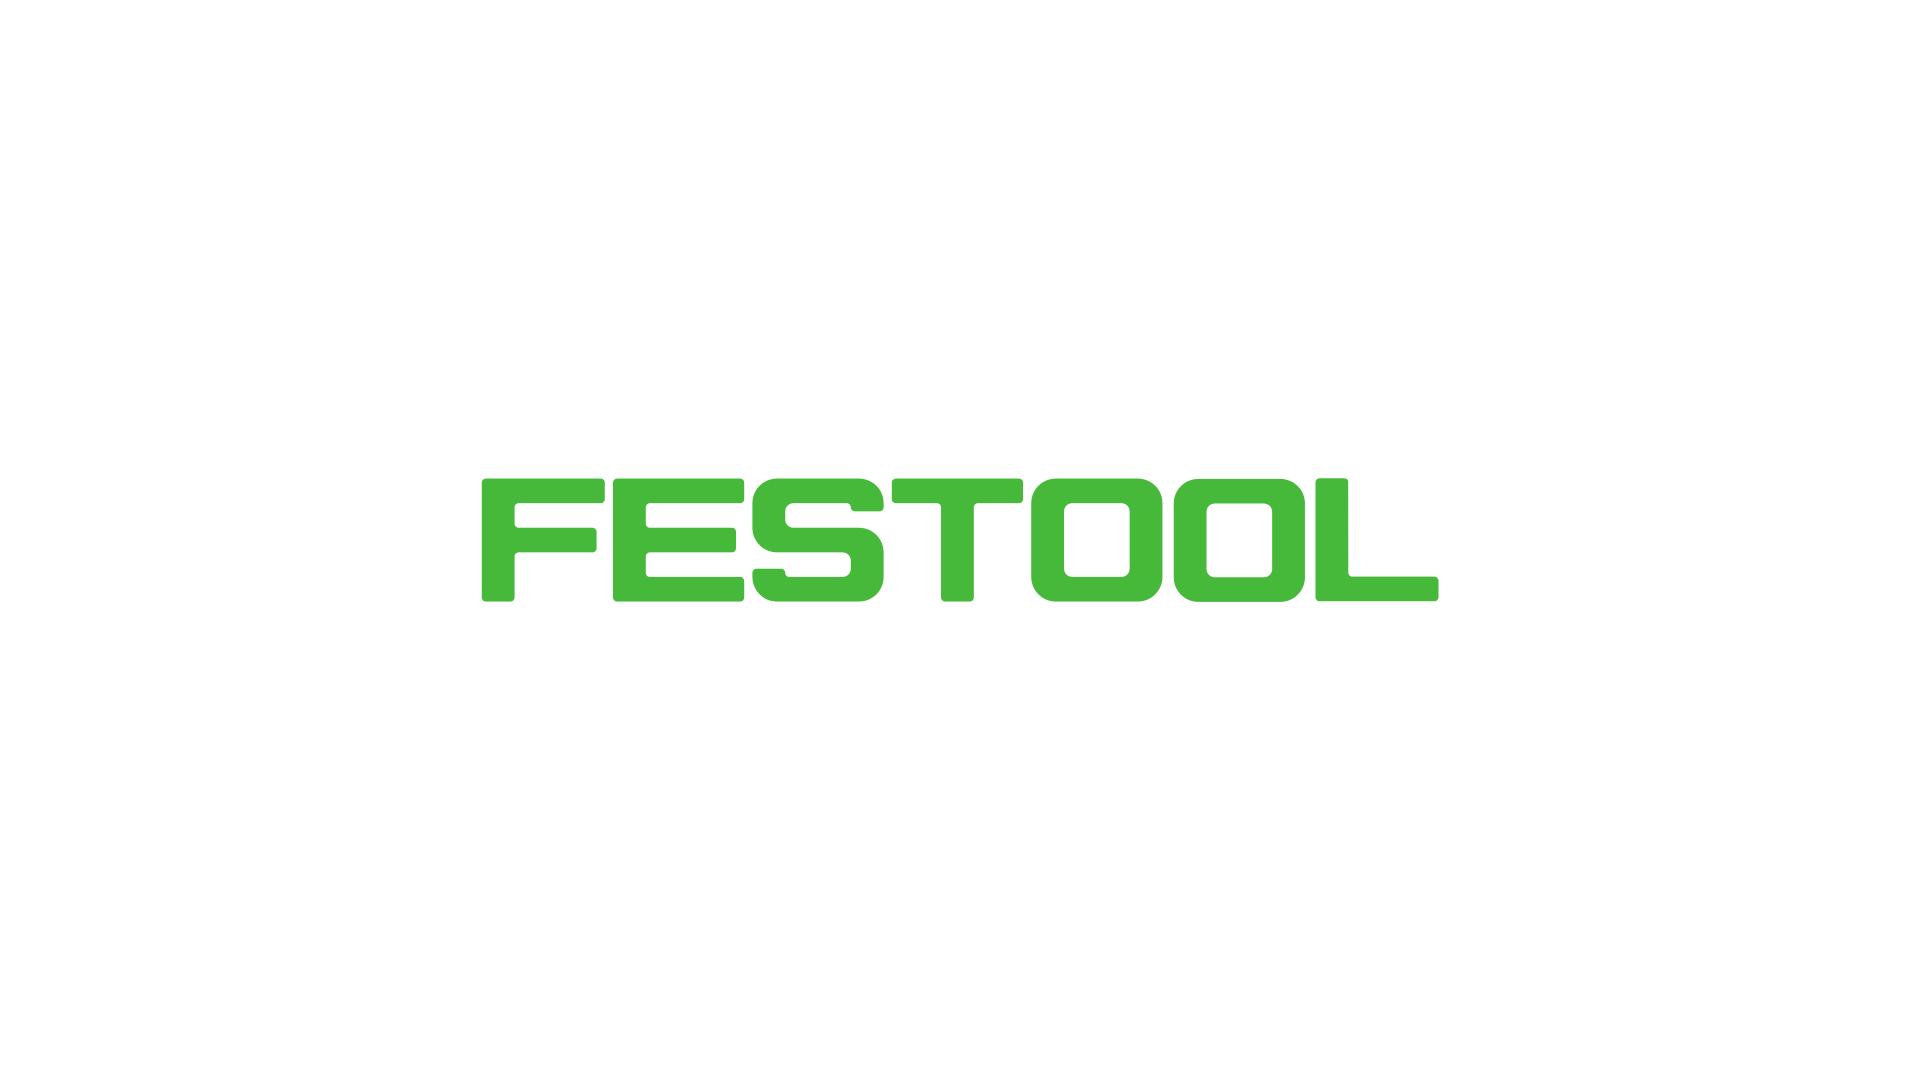 festool-png